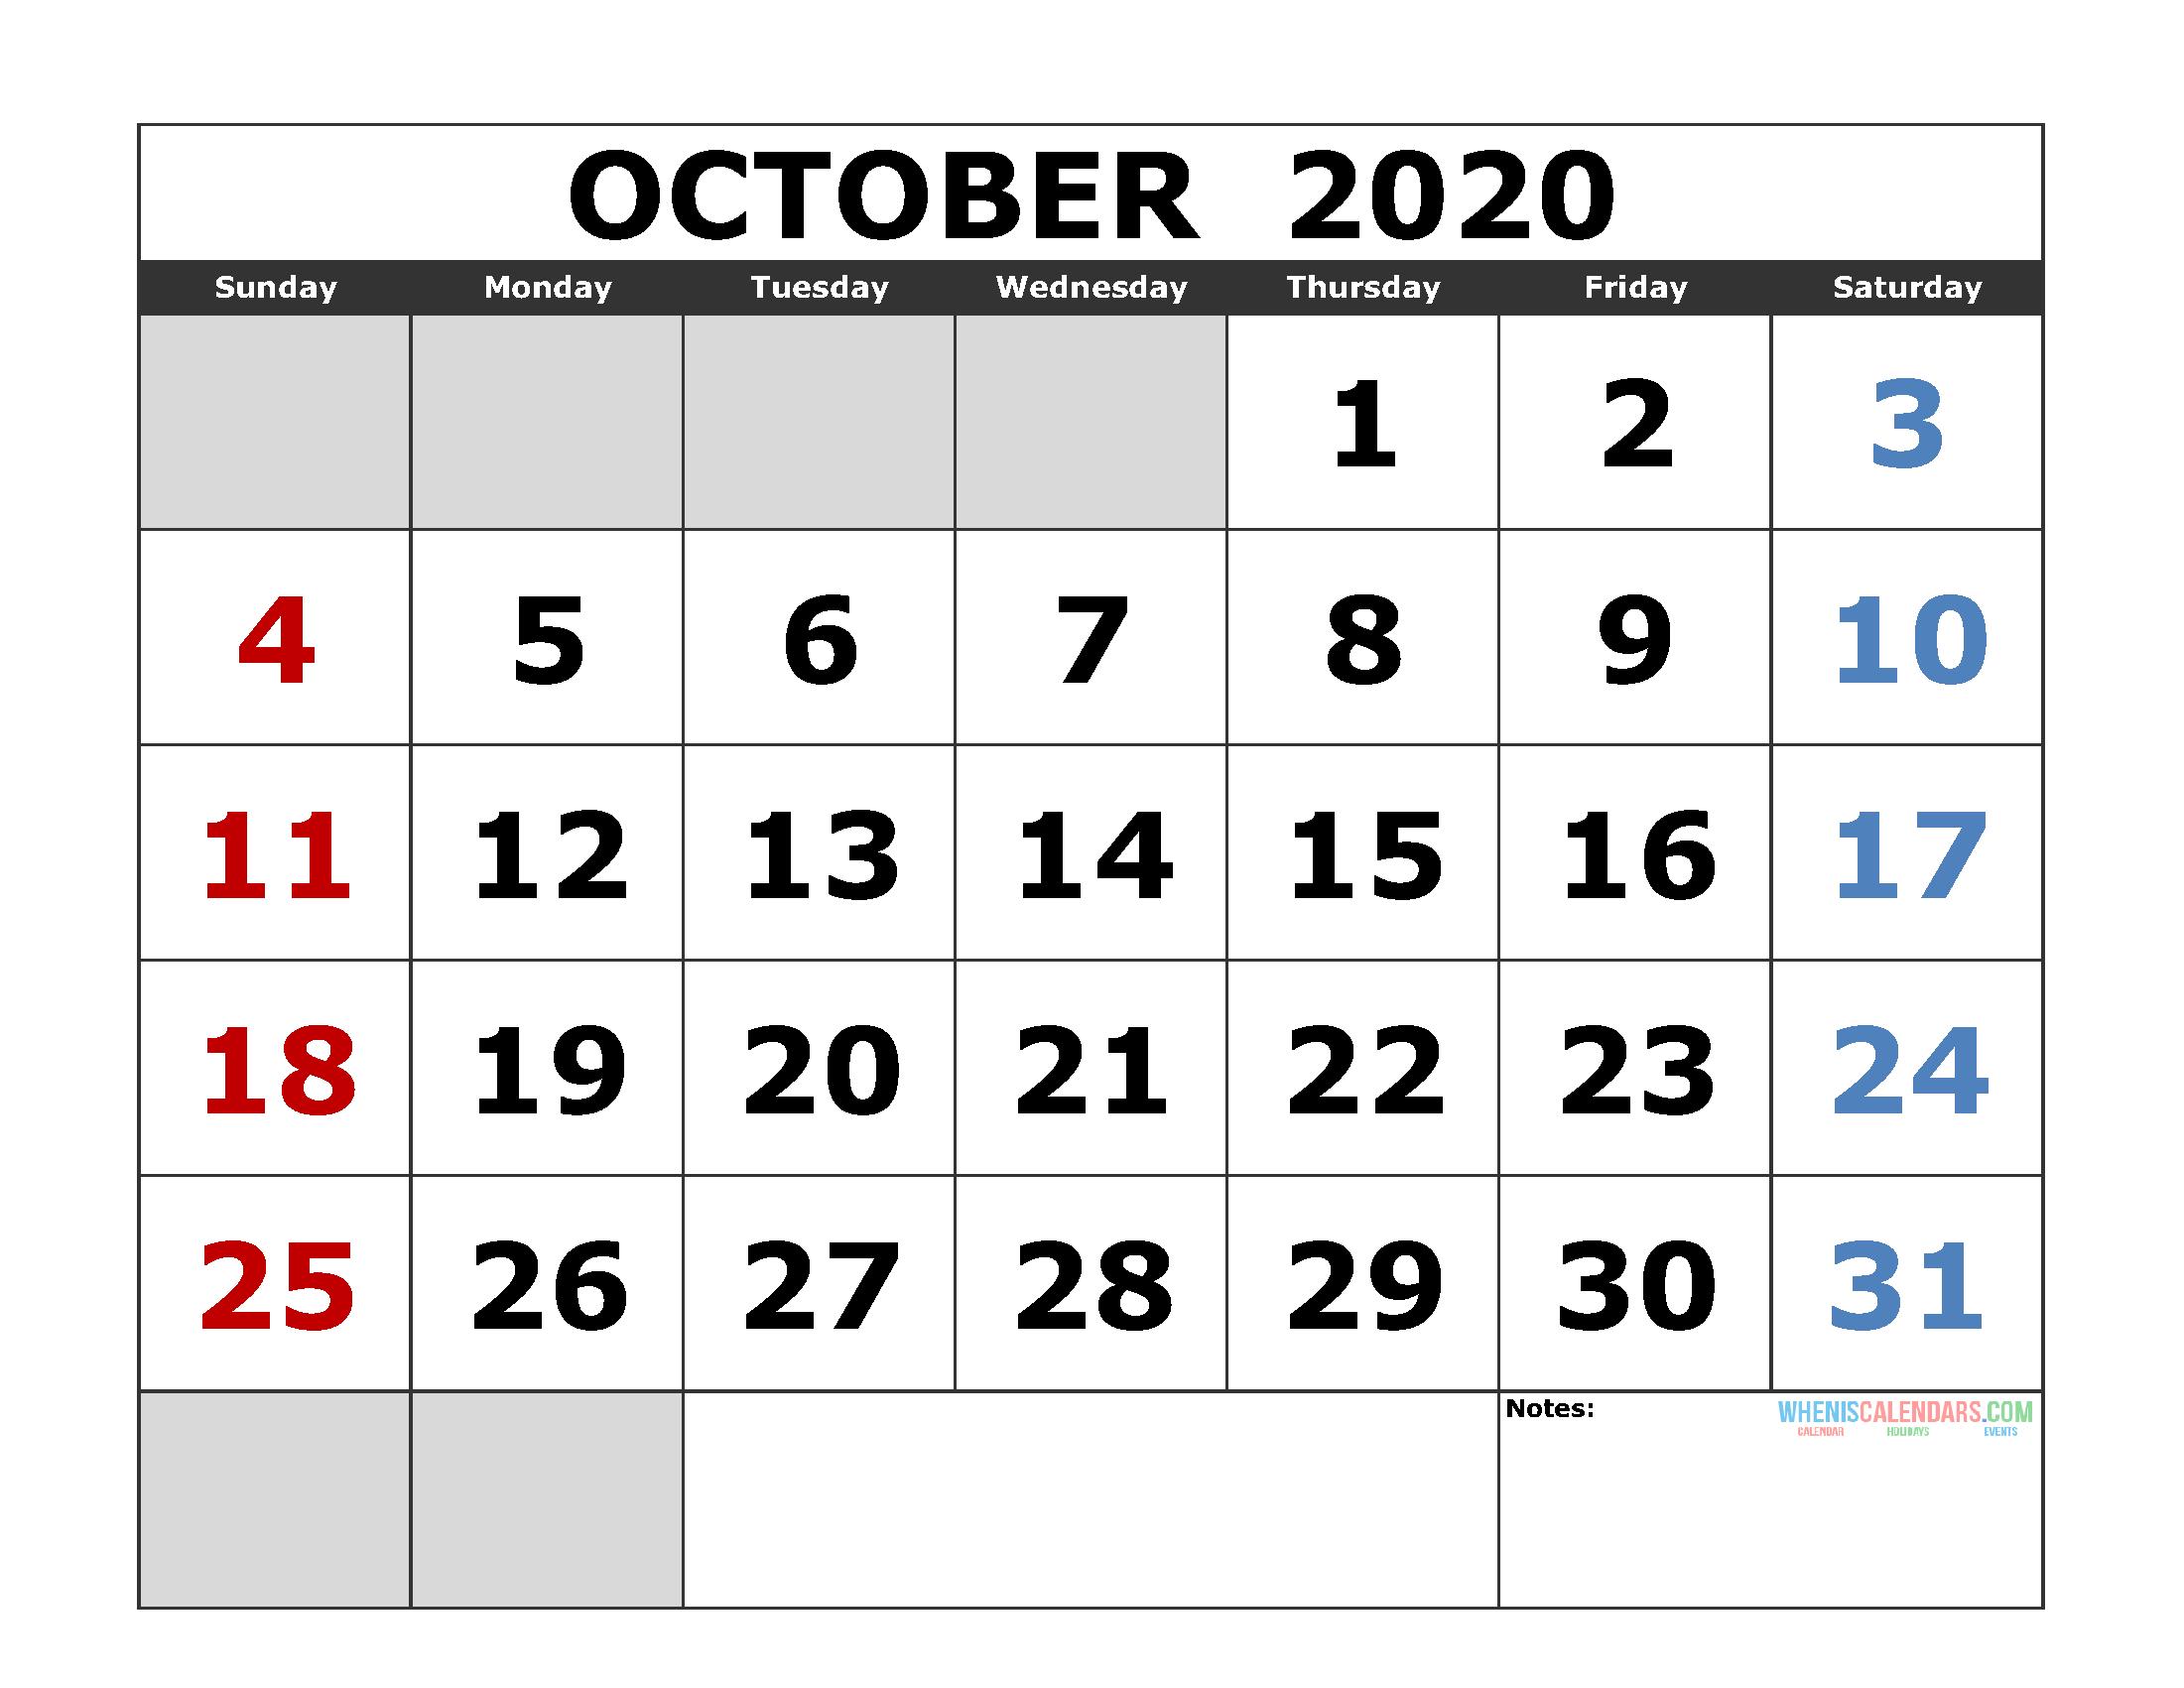 October 2020 Printable Calendar Template Excel, Pdf, Image